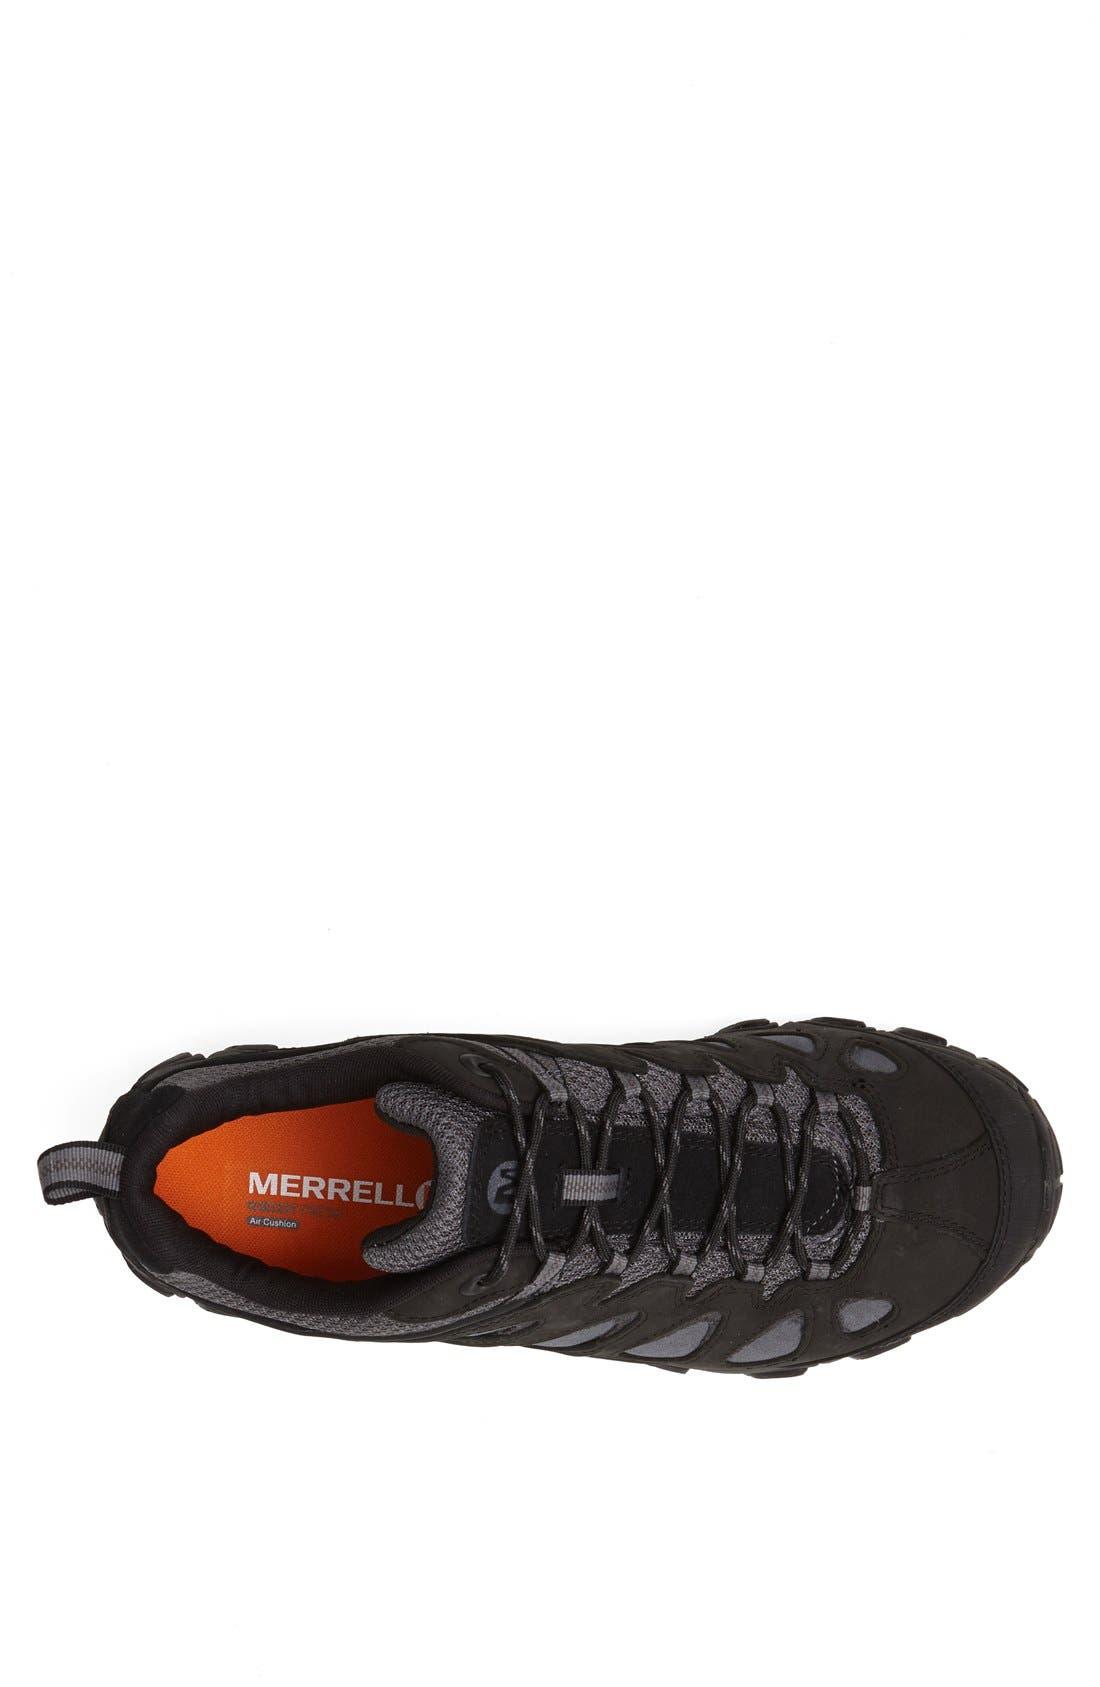 Alternate Image 3  - Merrell 'Pulsate' Hiking Shoe (Men)